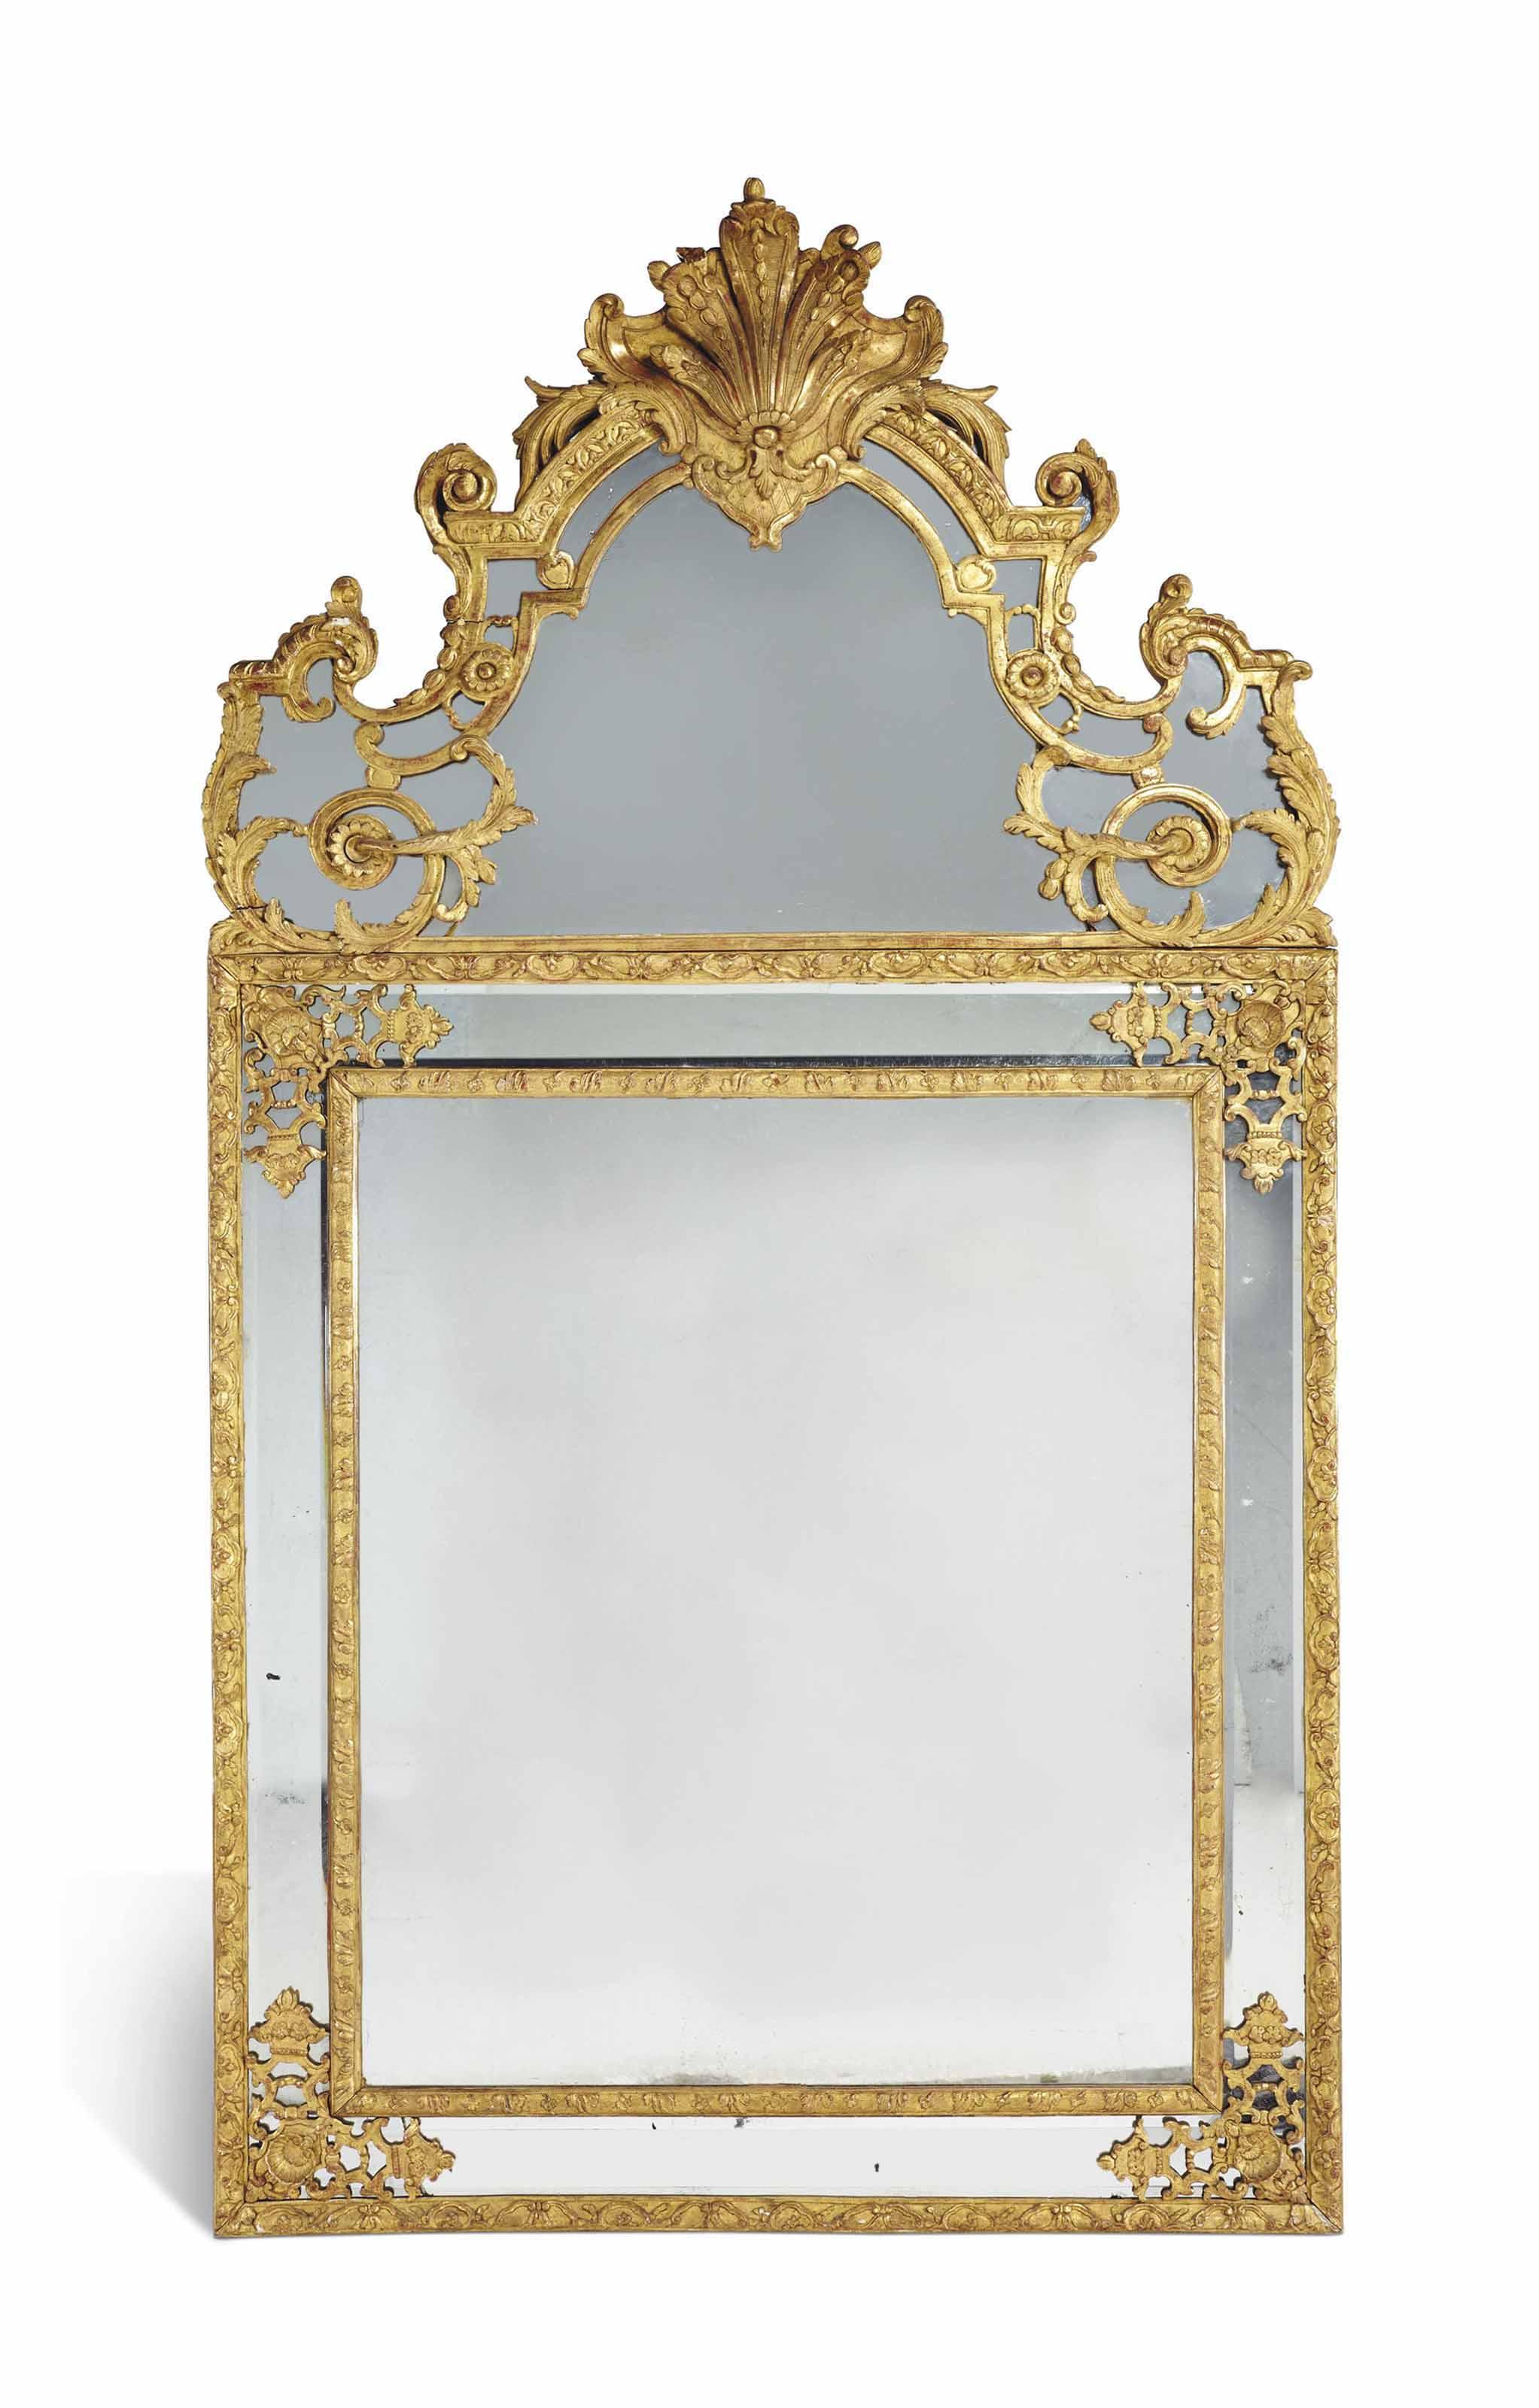 Miroir a parecloses de style regence fin du xixeme for Miroir de style